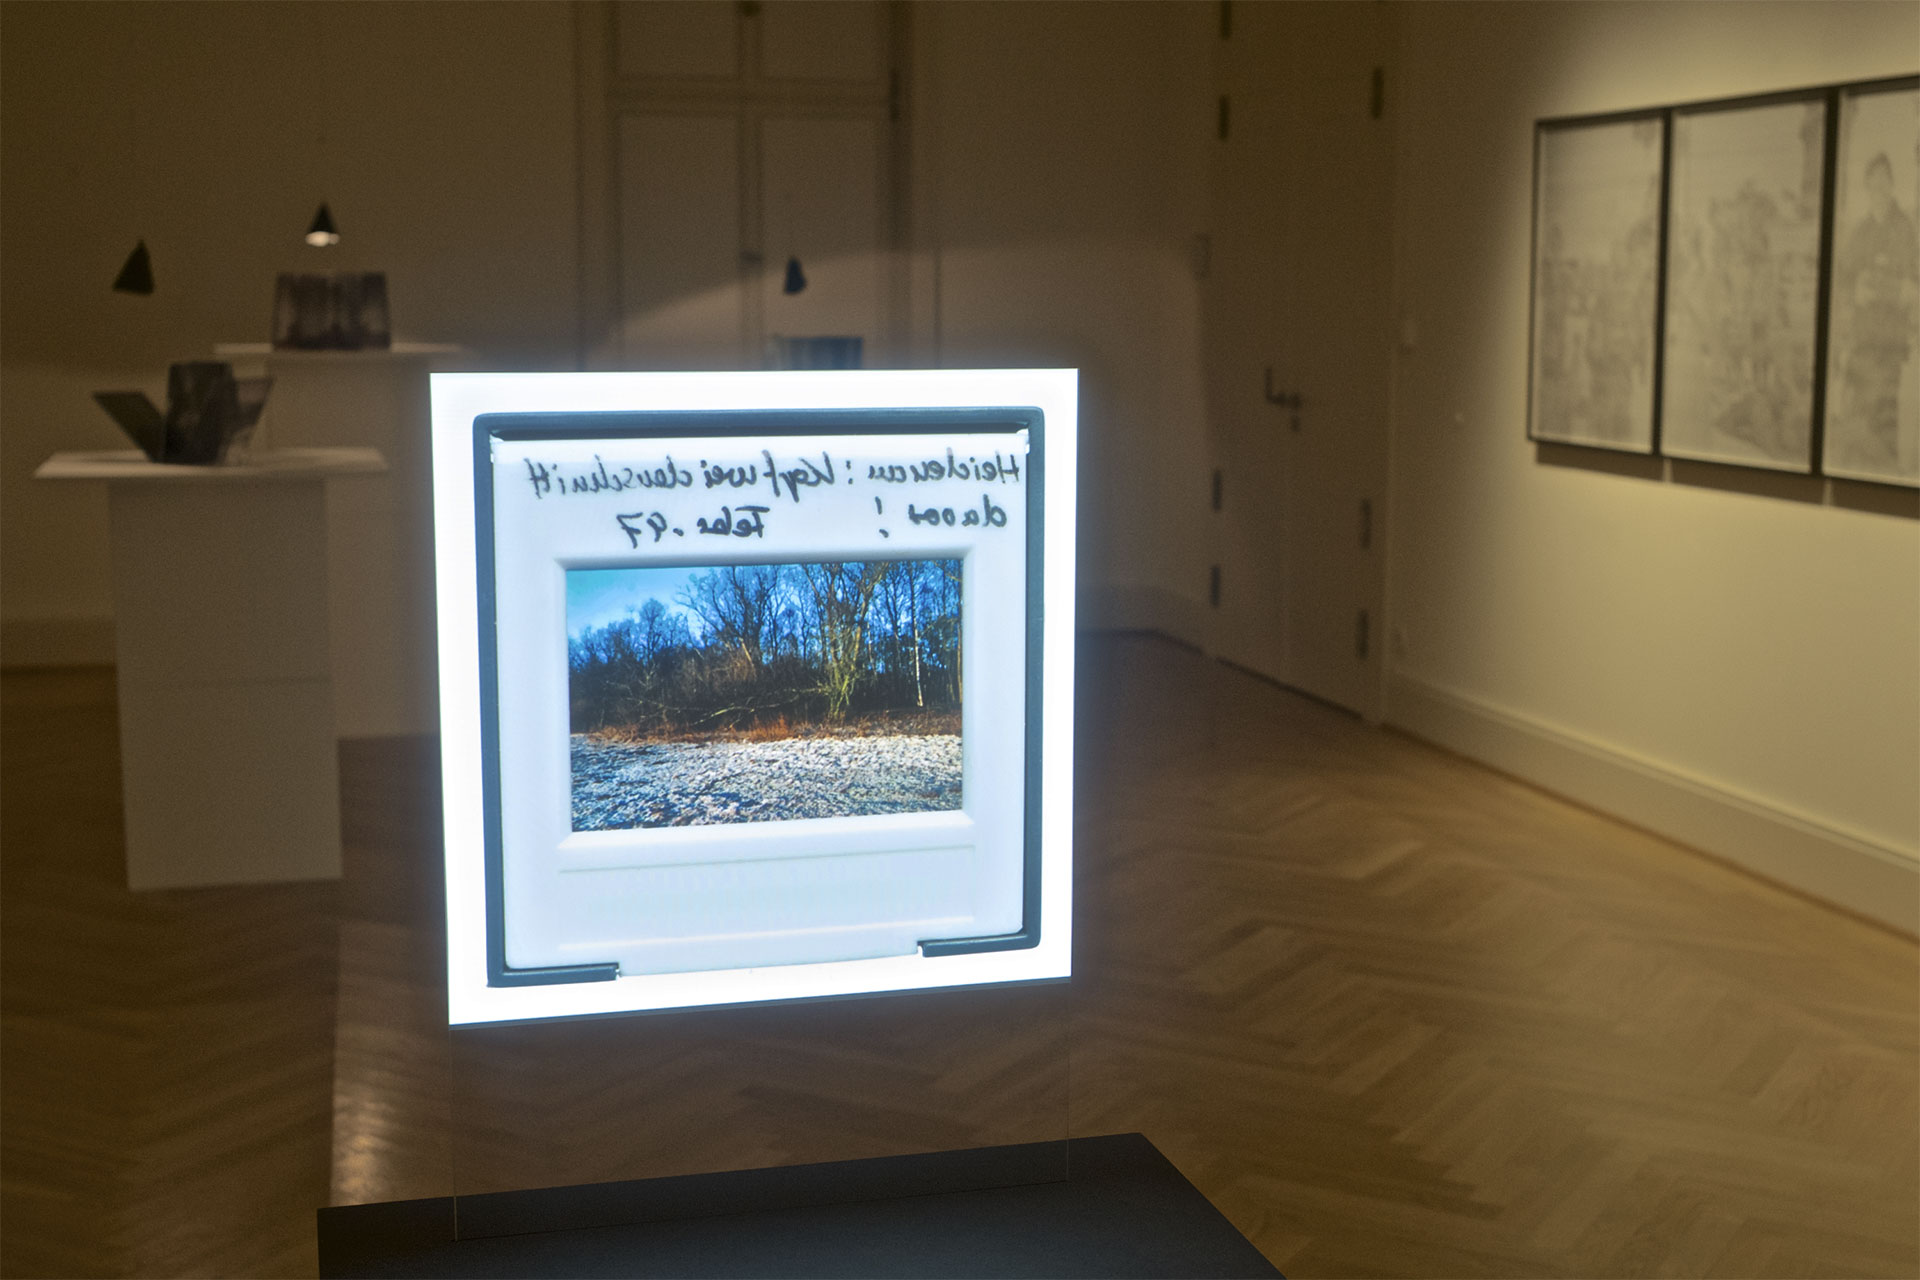 Sehnsucht nach dem Jetzt. Ausstellung im Schloss Biesdorf. Raum 1.06